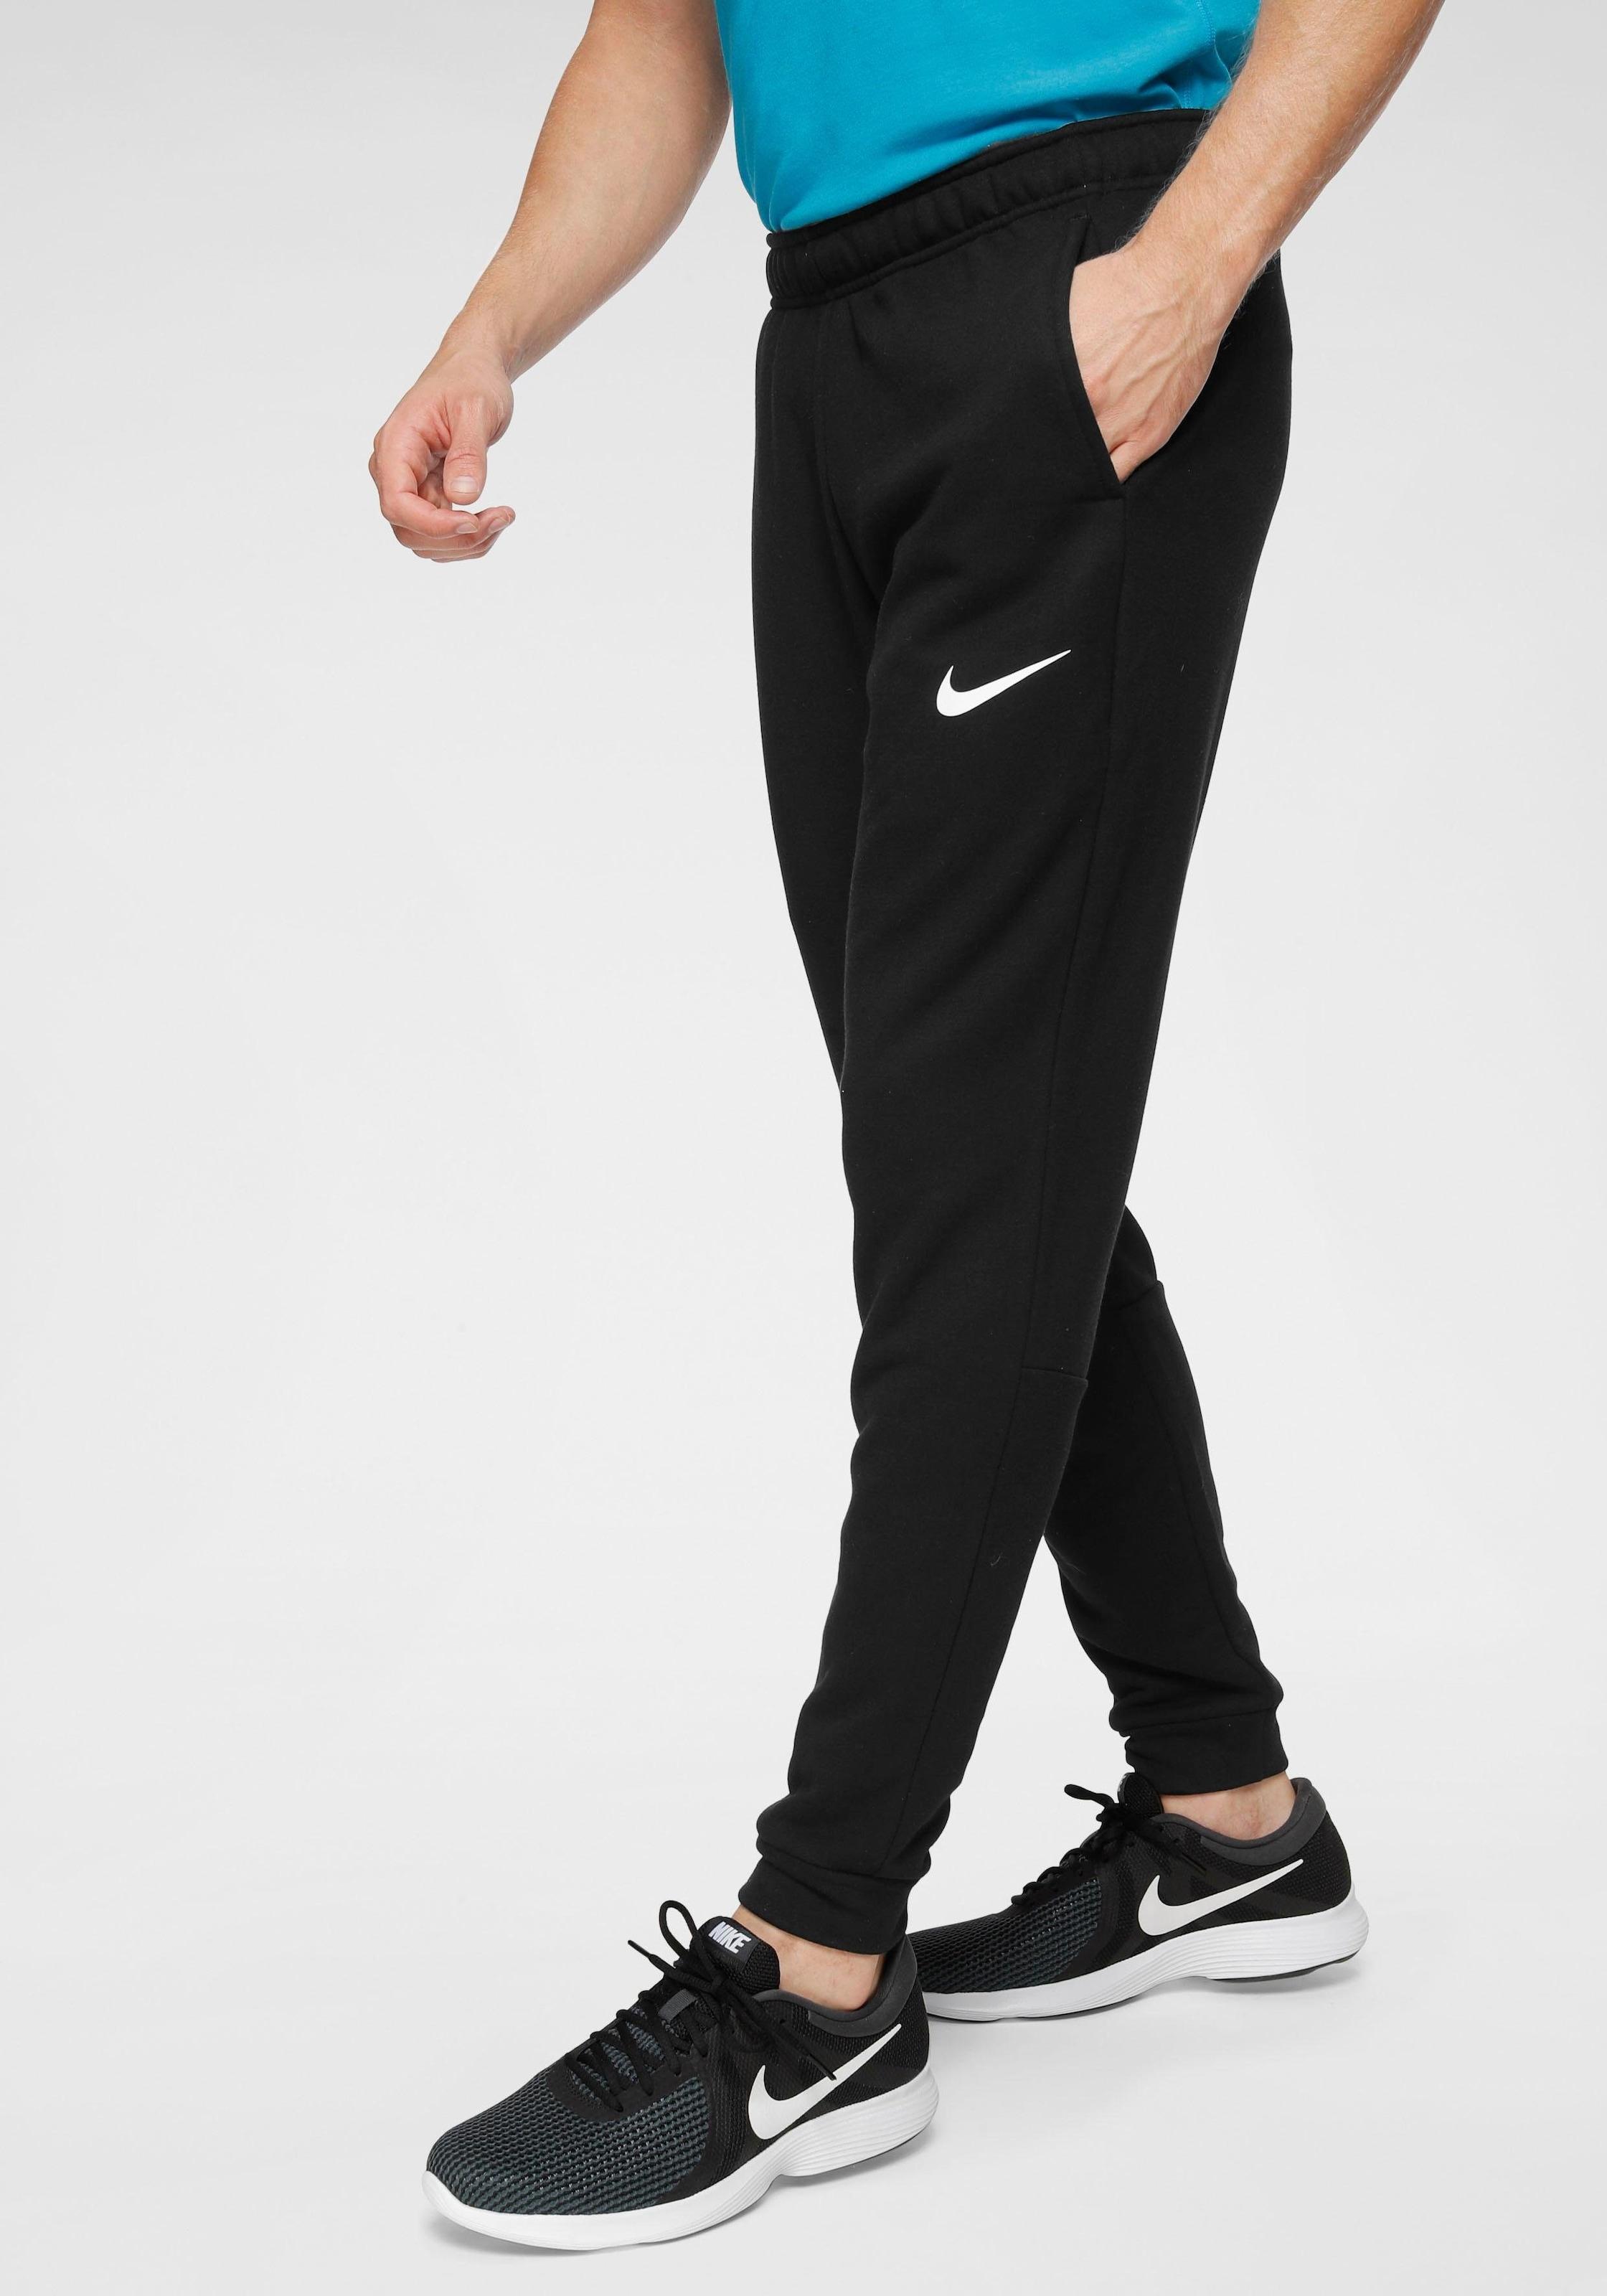 Nike Trainingshose »Nike Dri FIT Men's Fleece Training Pants« auf Raten | BAUR